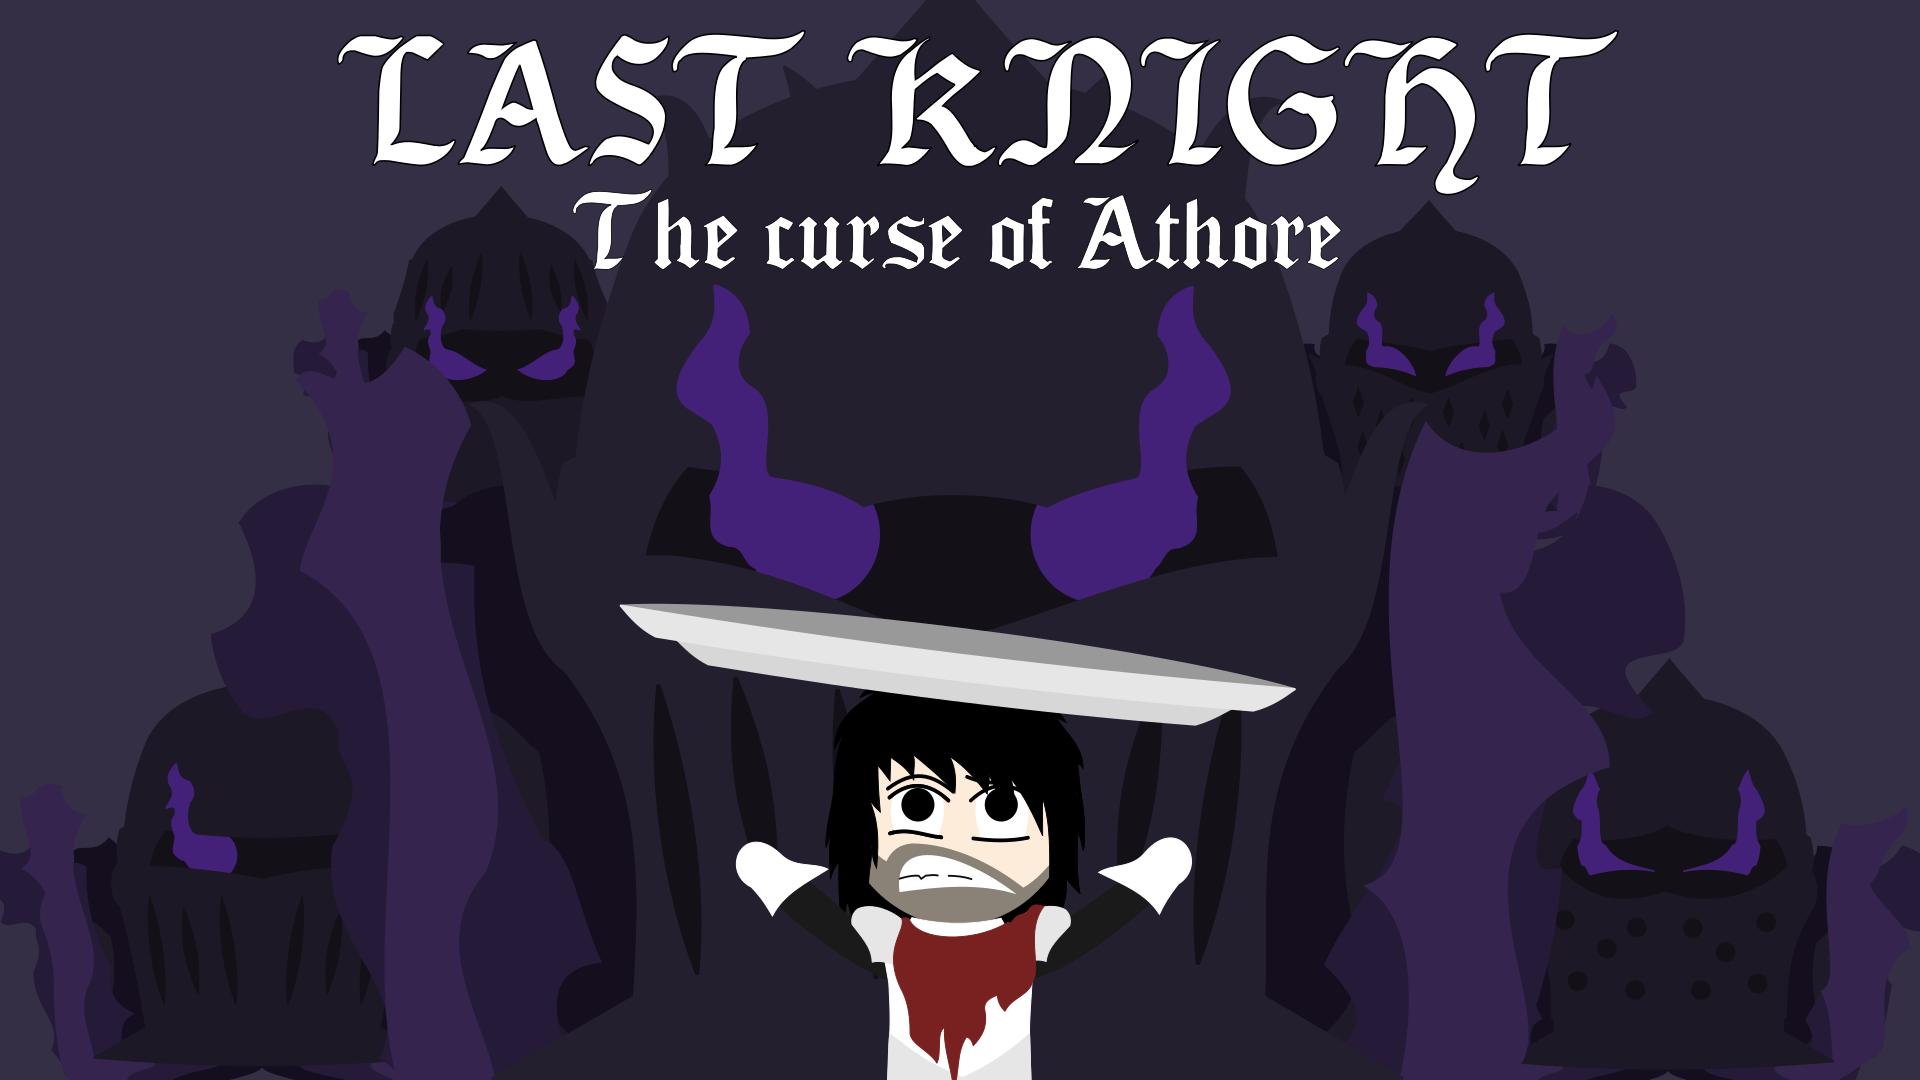 Last Knight: The curse of Athore